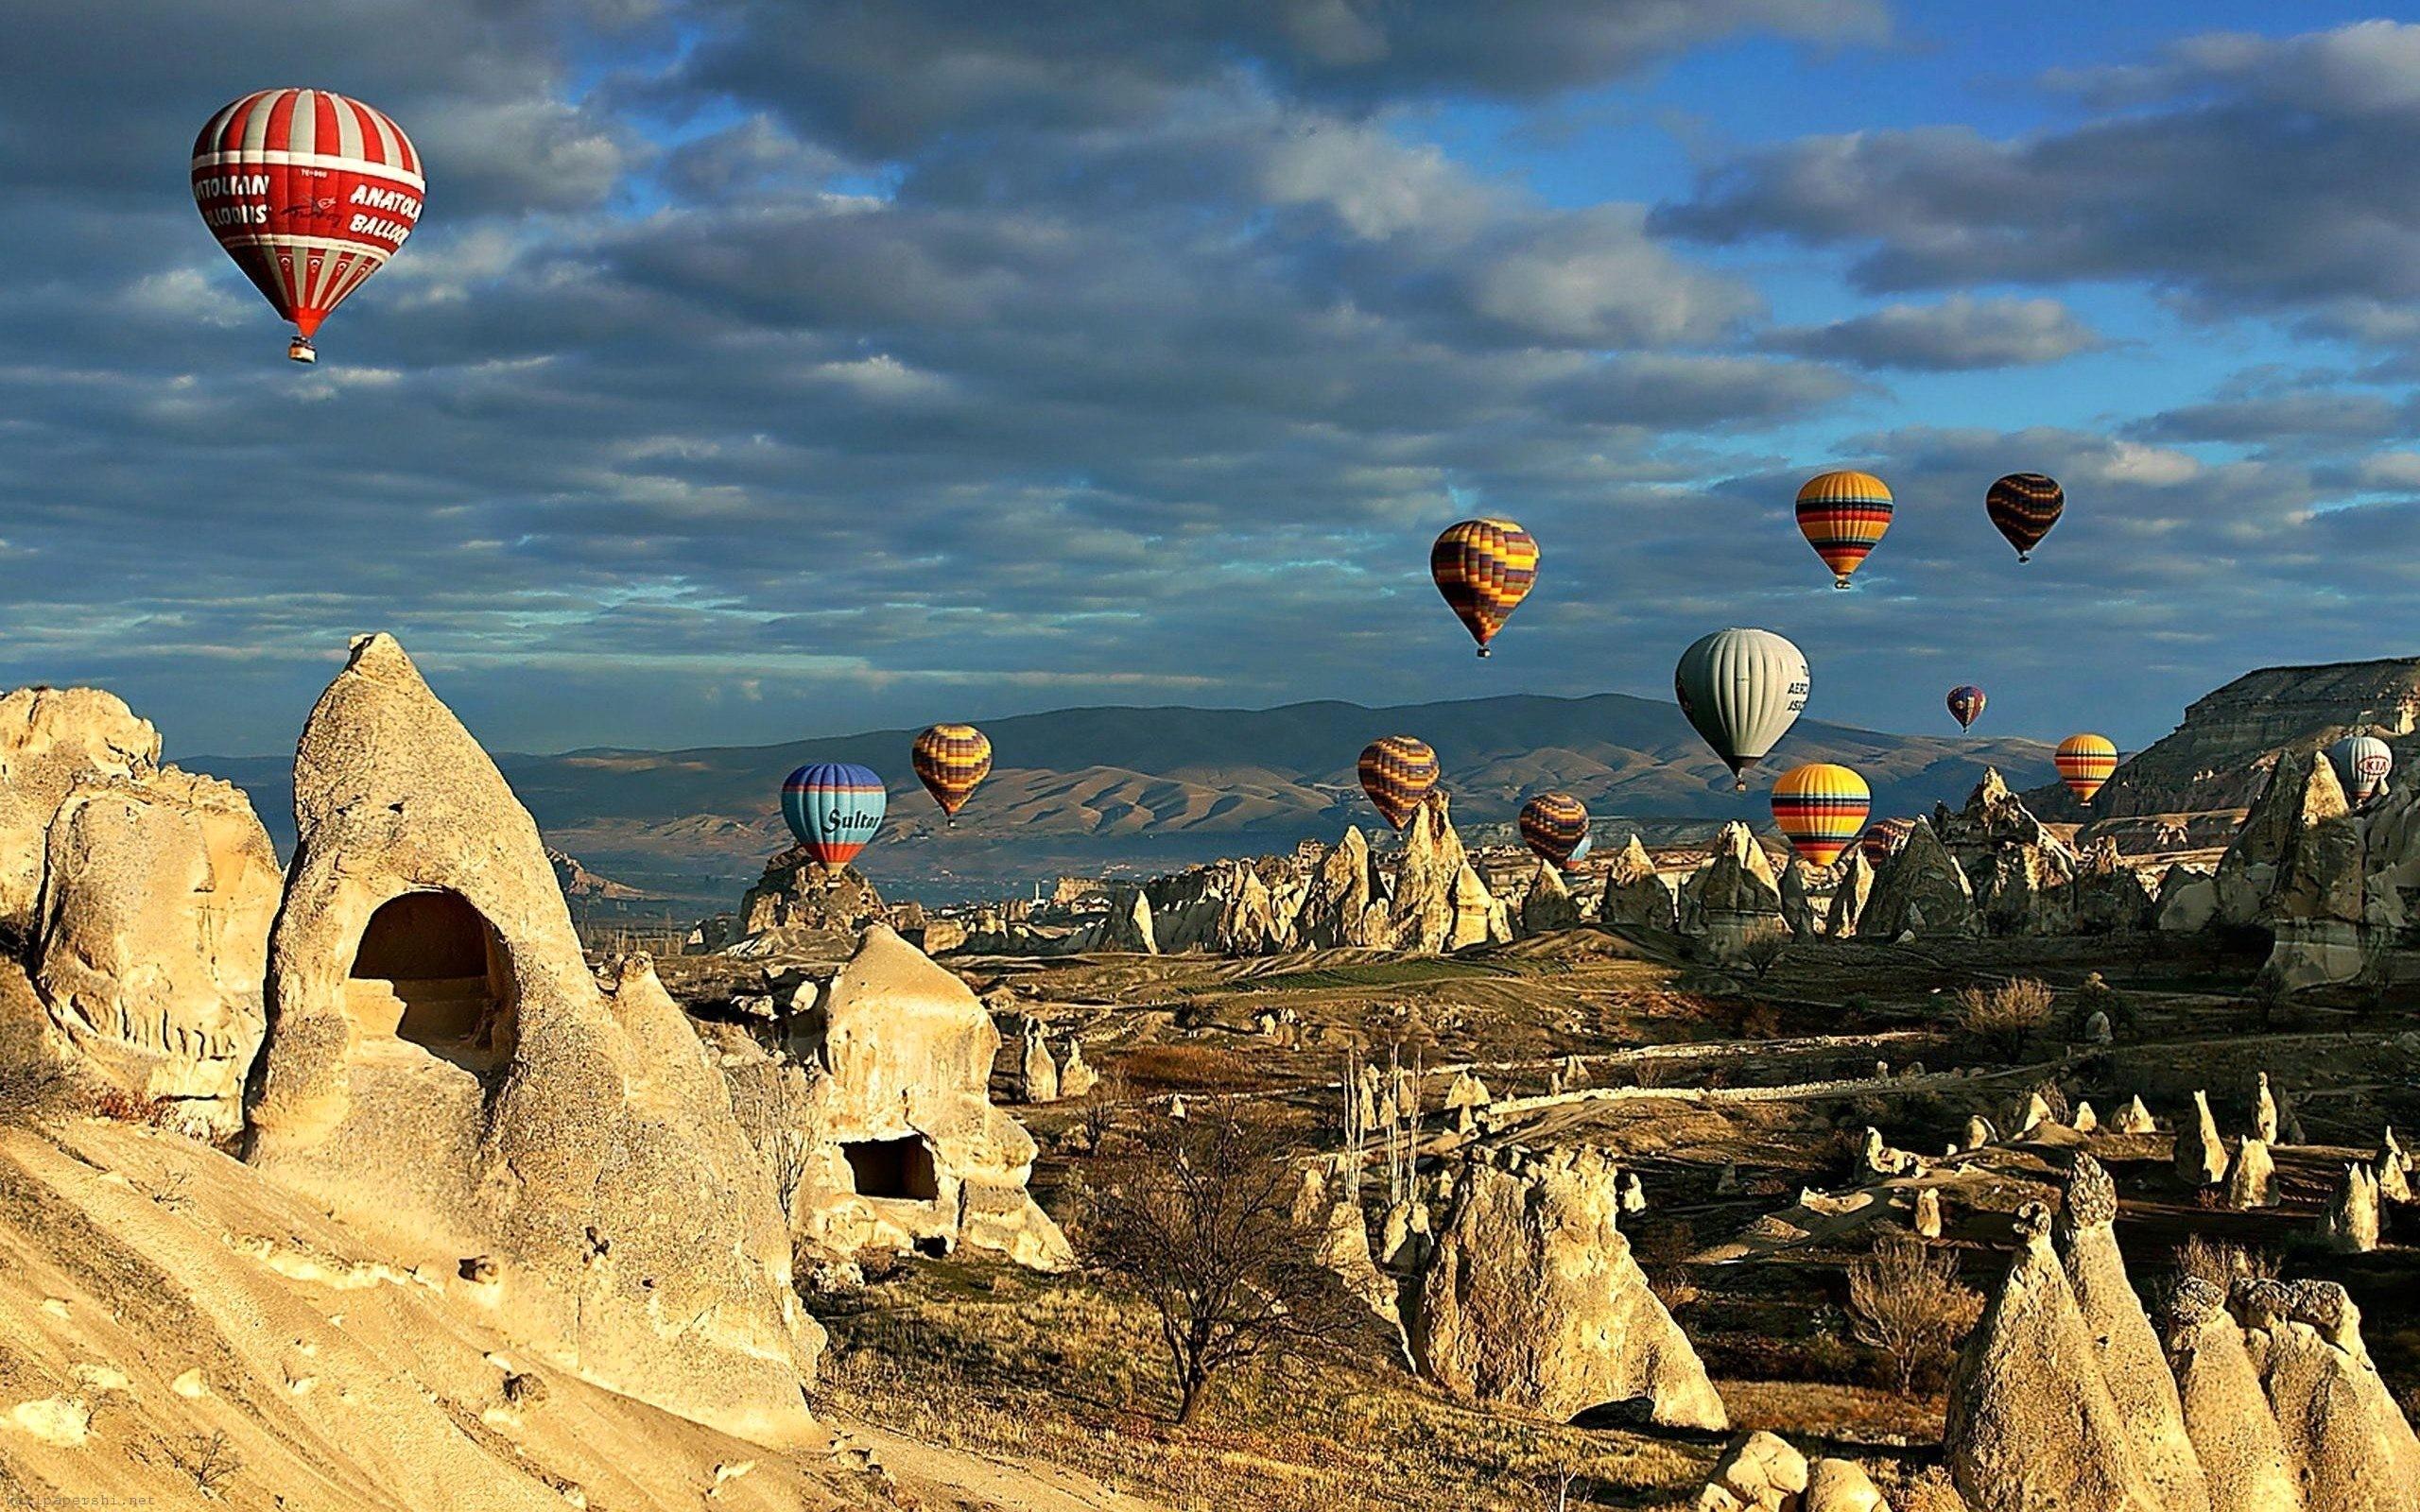 Res: 2560x1600, Turkey Wallpaper